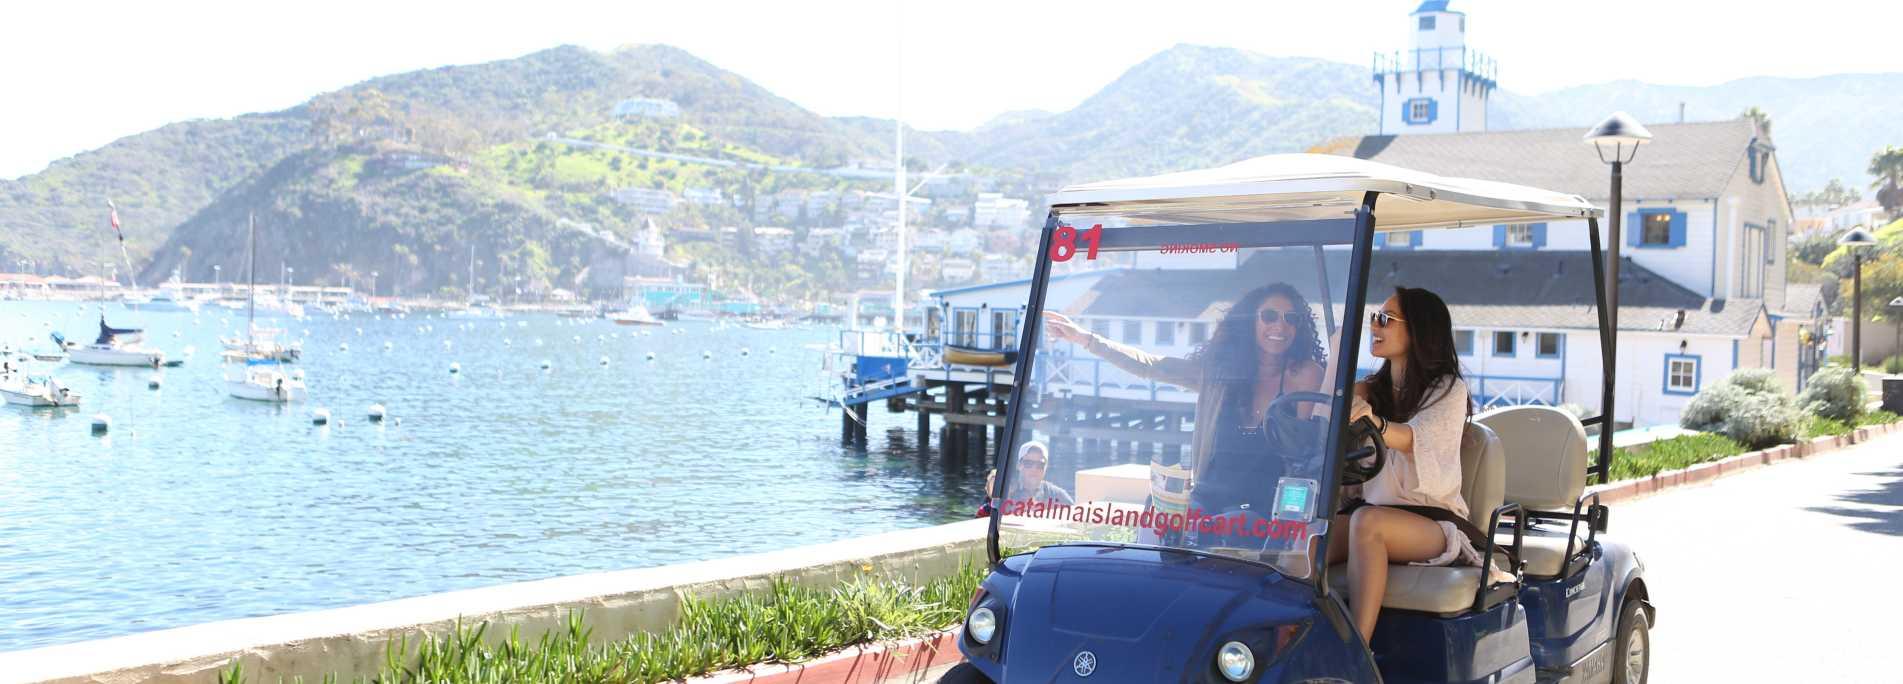 Catalina Island Golf Cart Als Tours